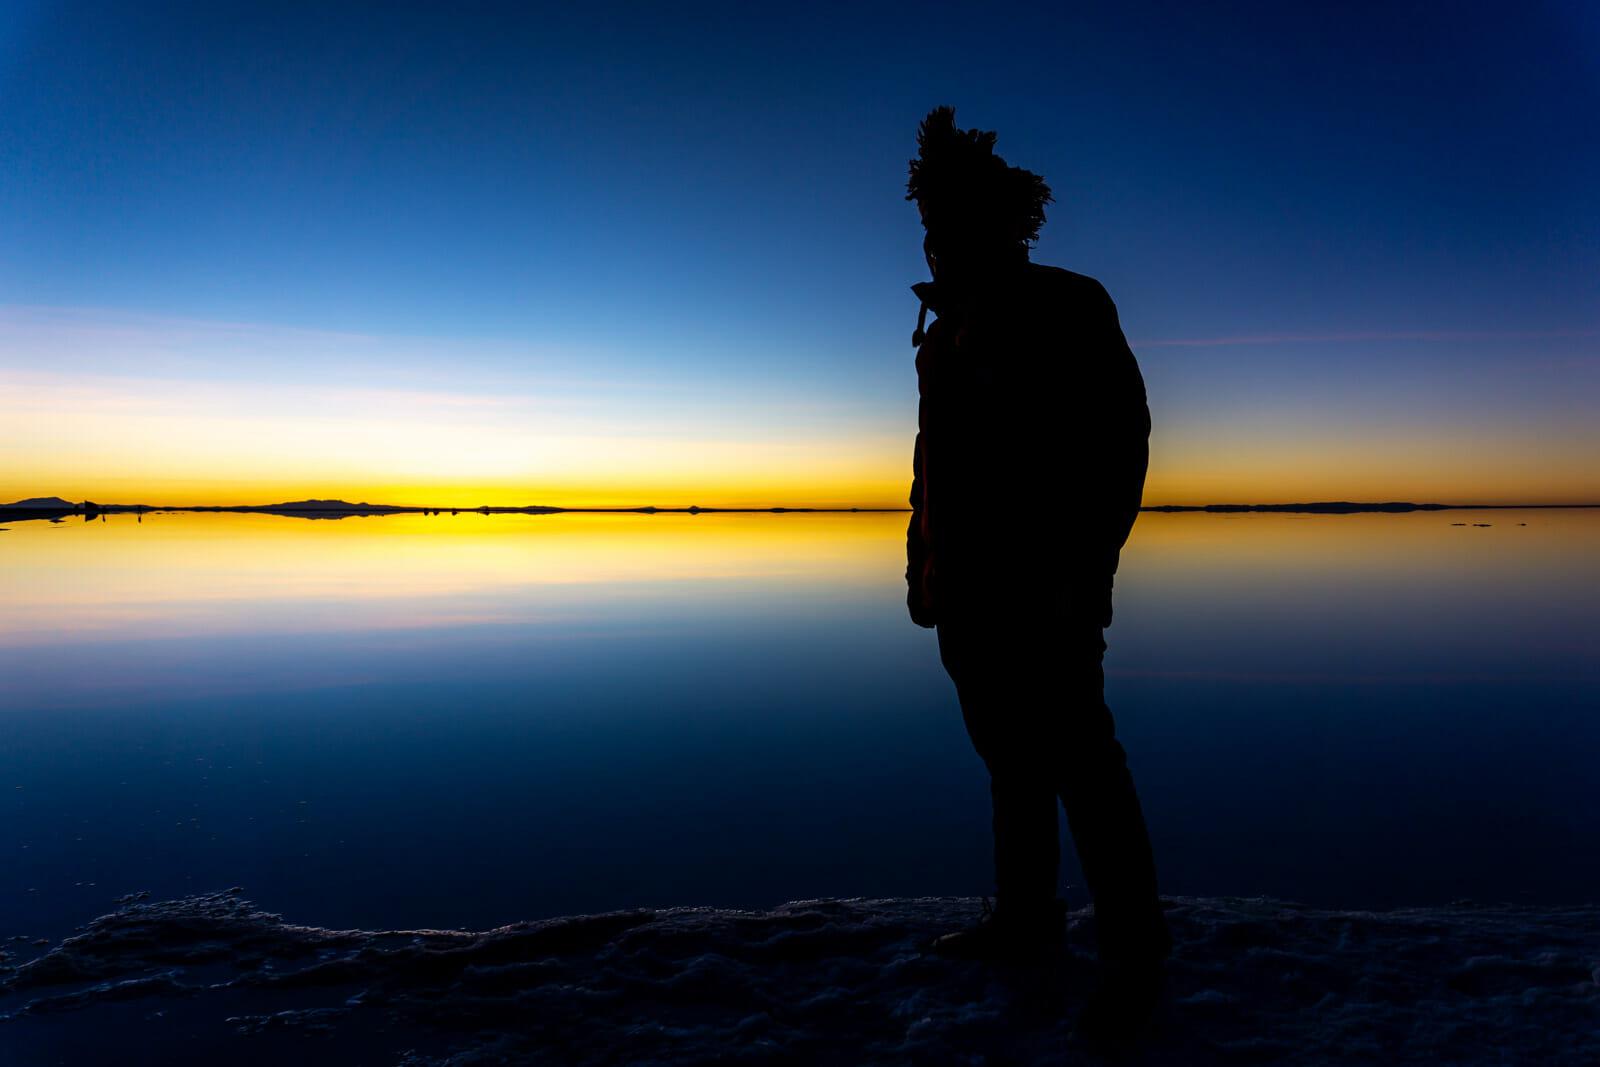 Sunrise of Wonders at the Salar de Uyuni